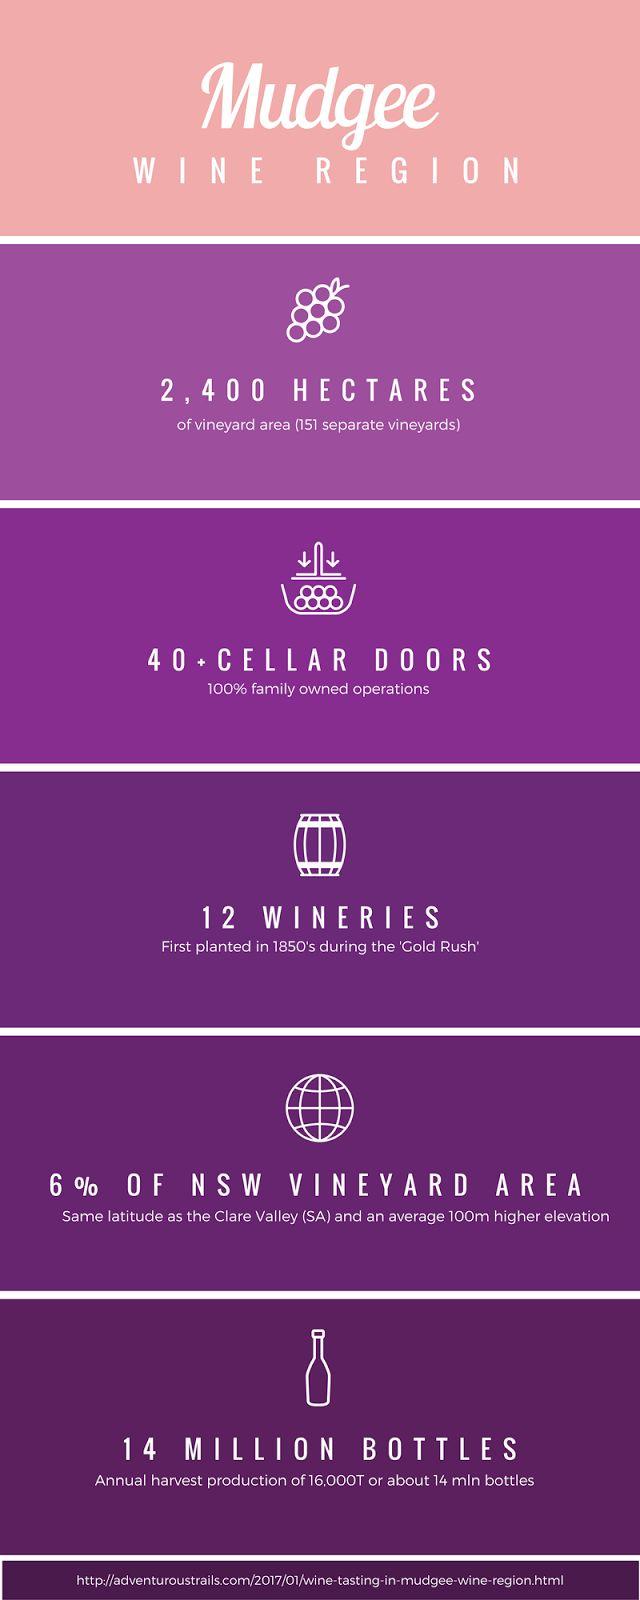 Wine tasting in Mudgee Wine Region